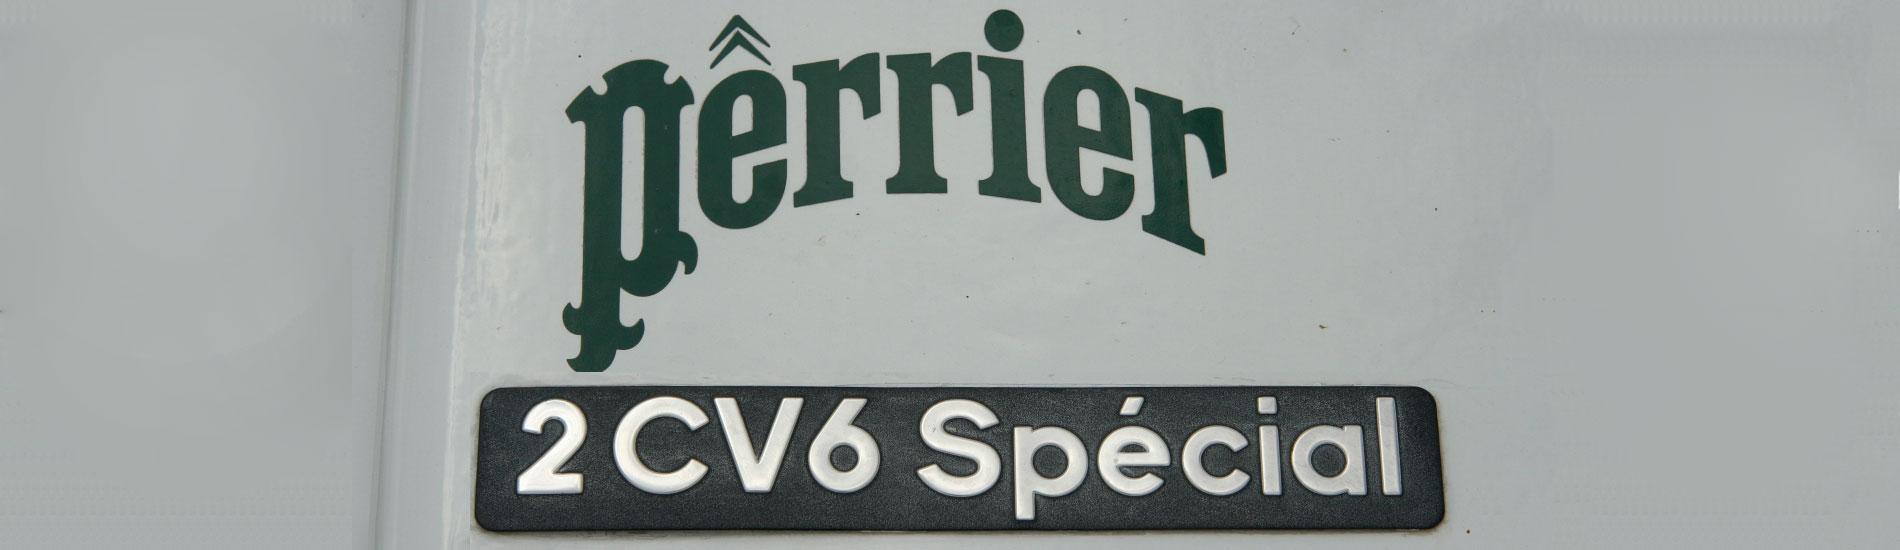 Citroen 2CV Perrier